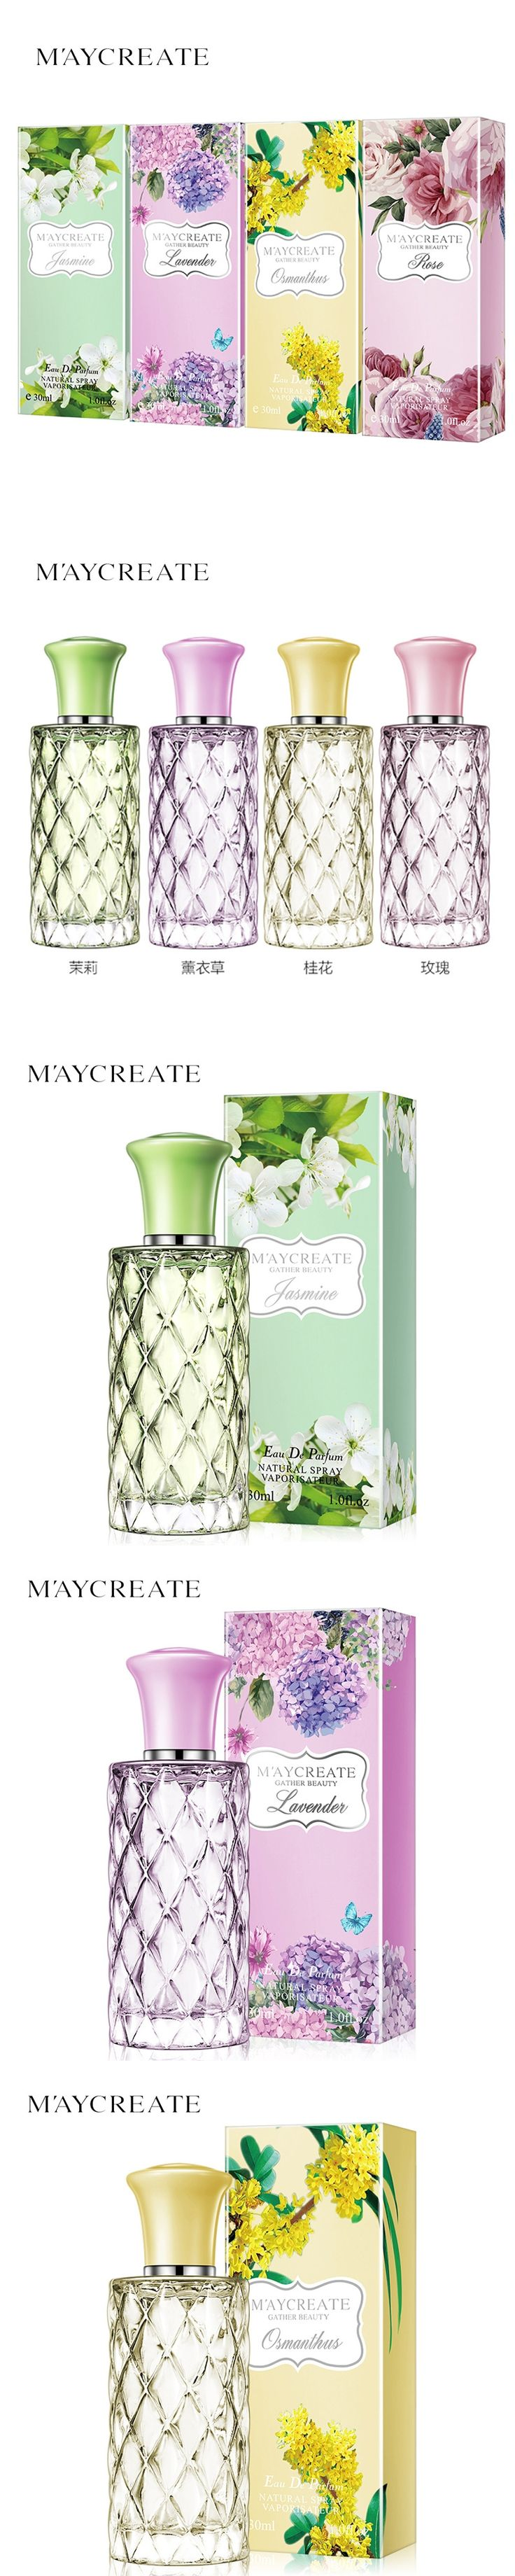 30ml MayCreate Flower Fragrance Lasting Perfume Of Fresh And Elegant Cosmetics Perfume Women Makeup Natural Oriental Taste